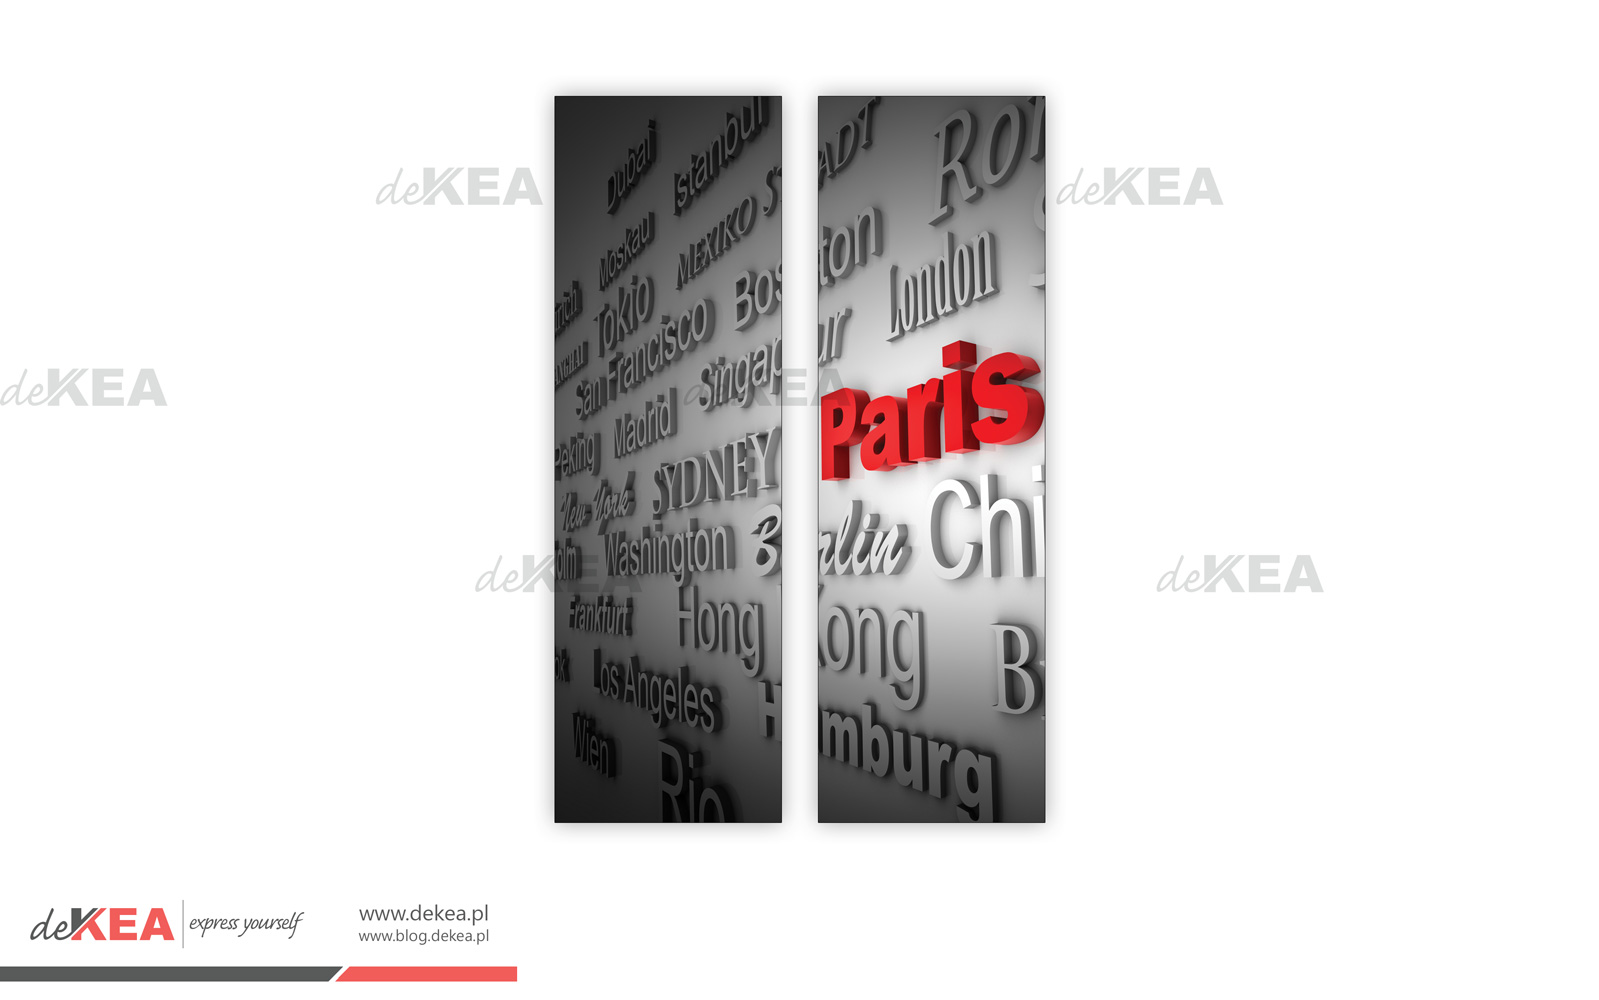 Fotorolety deKEA Paryż